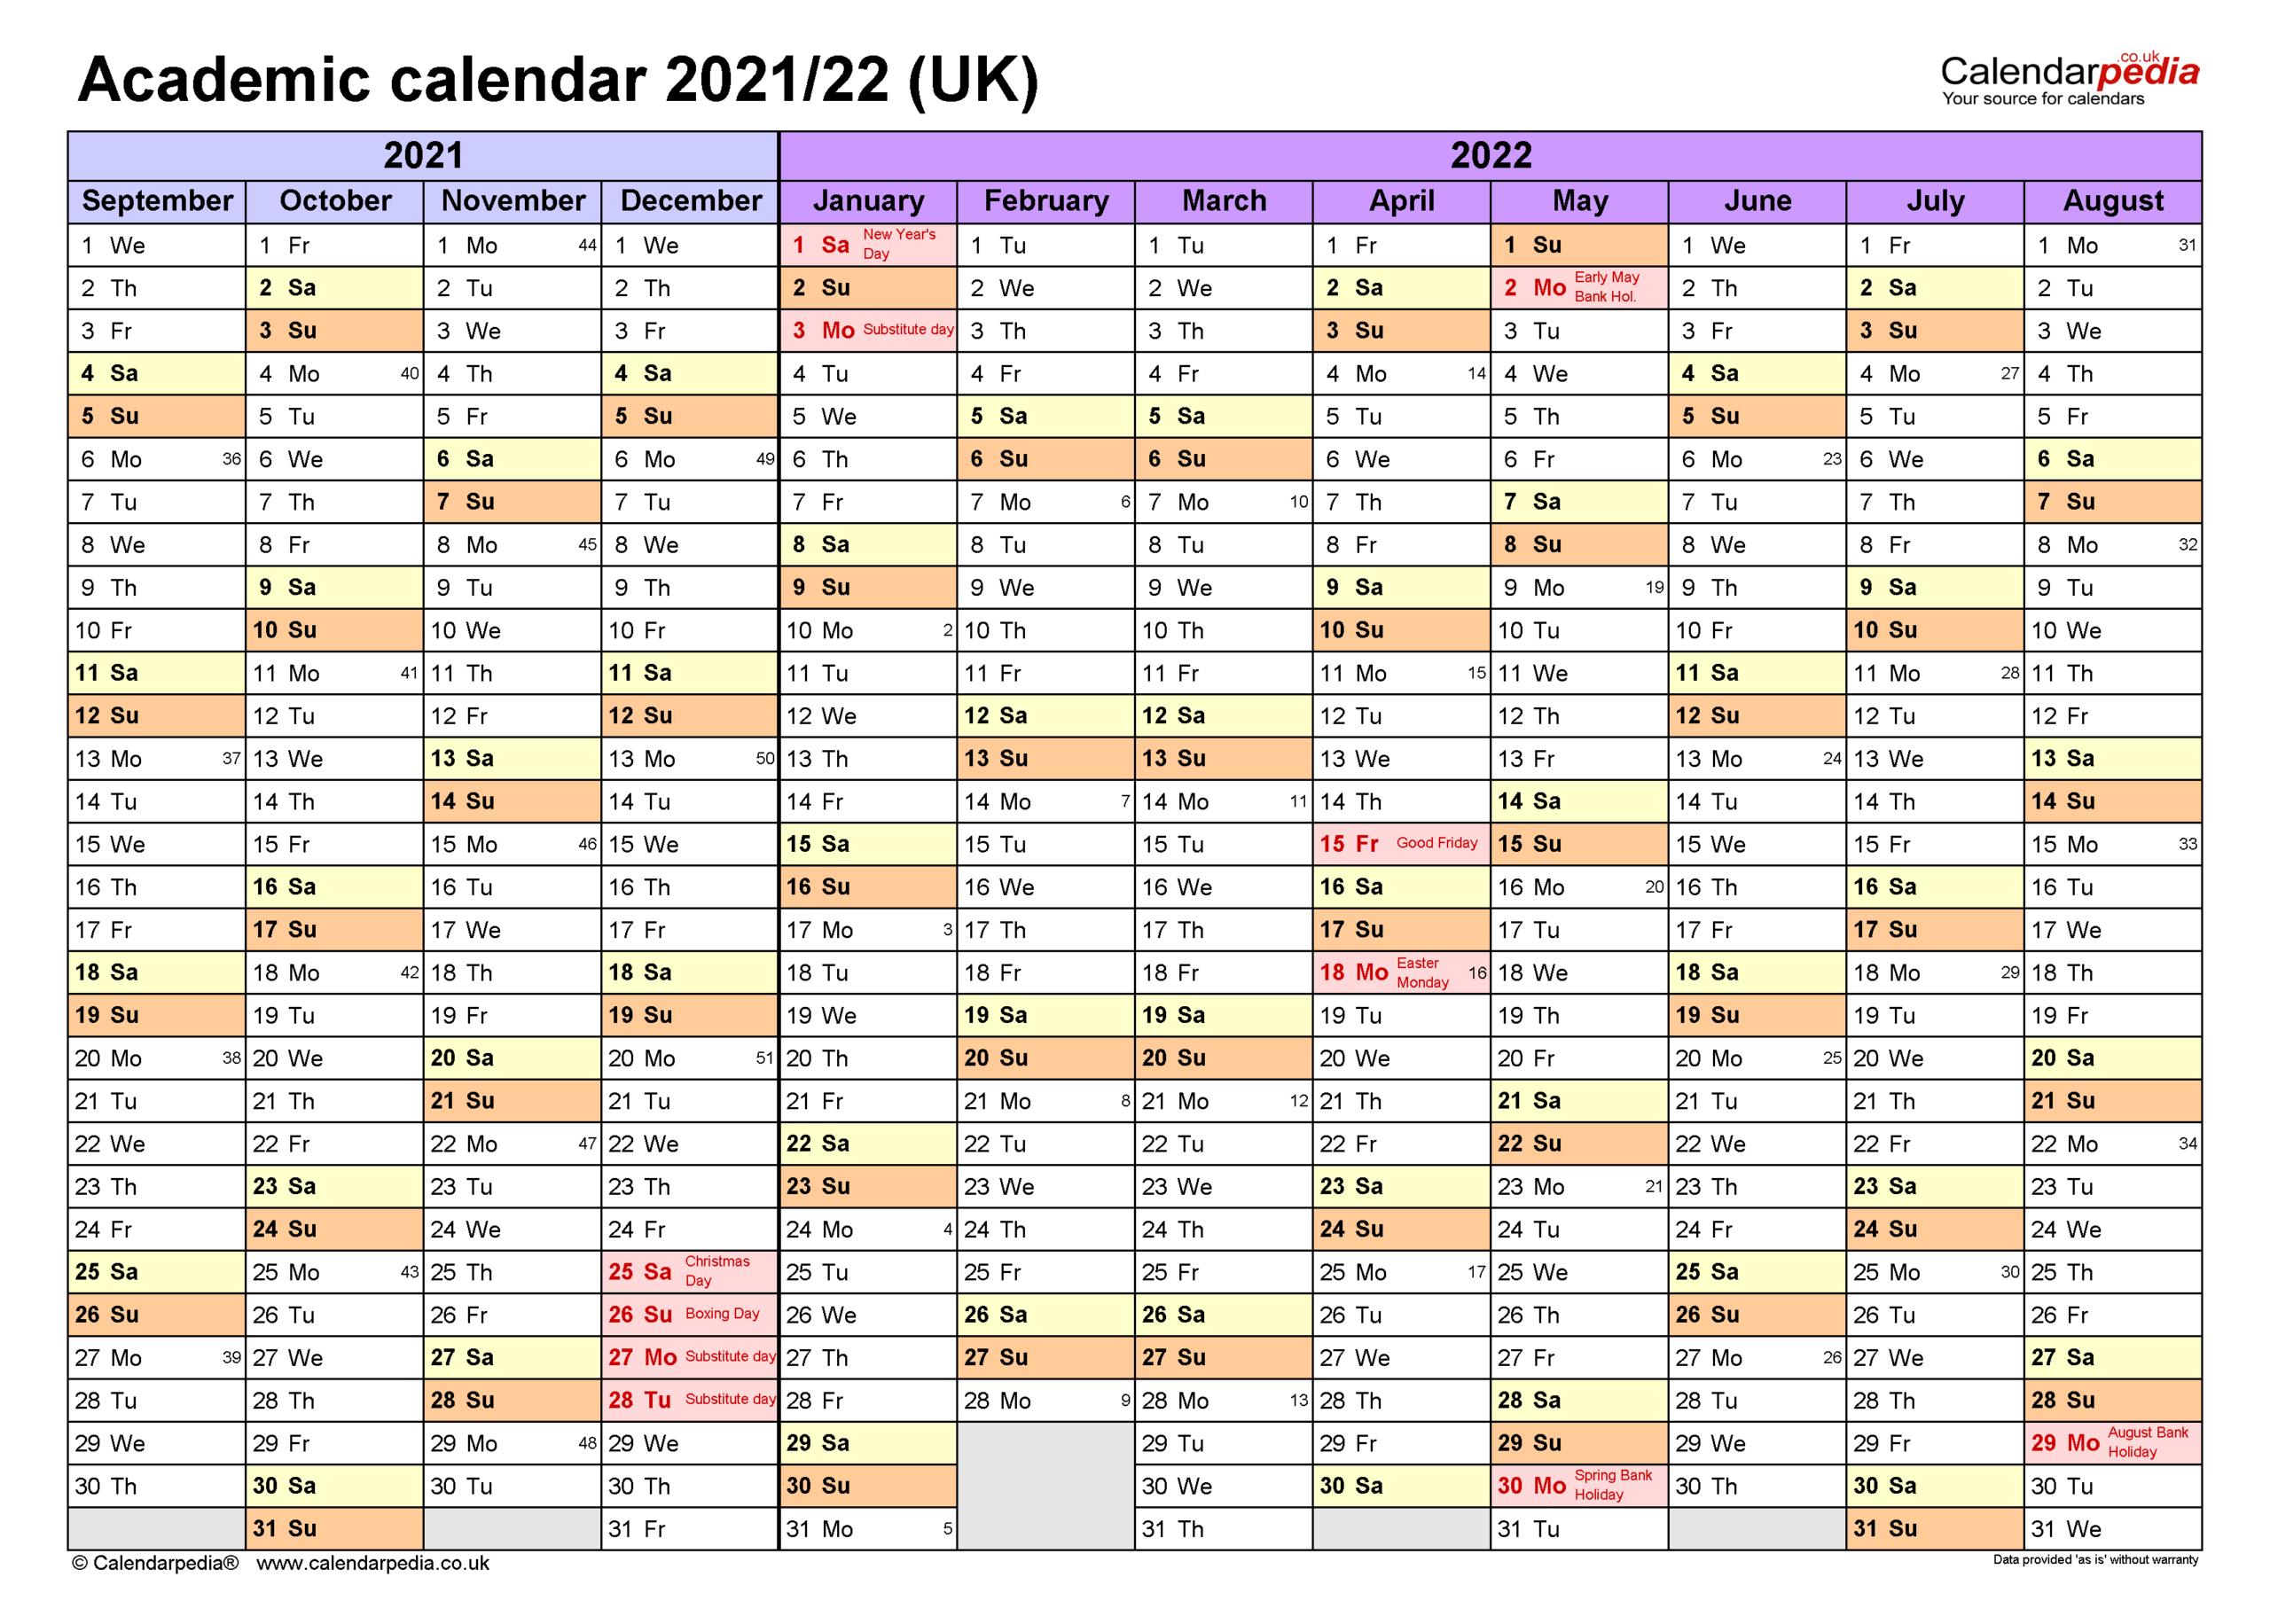 Academic Calendar 2021 22 | Printable Calendars 2021